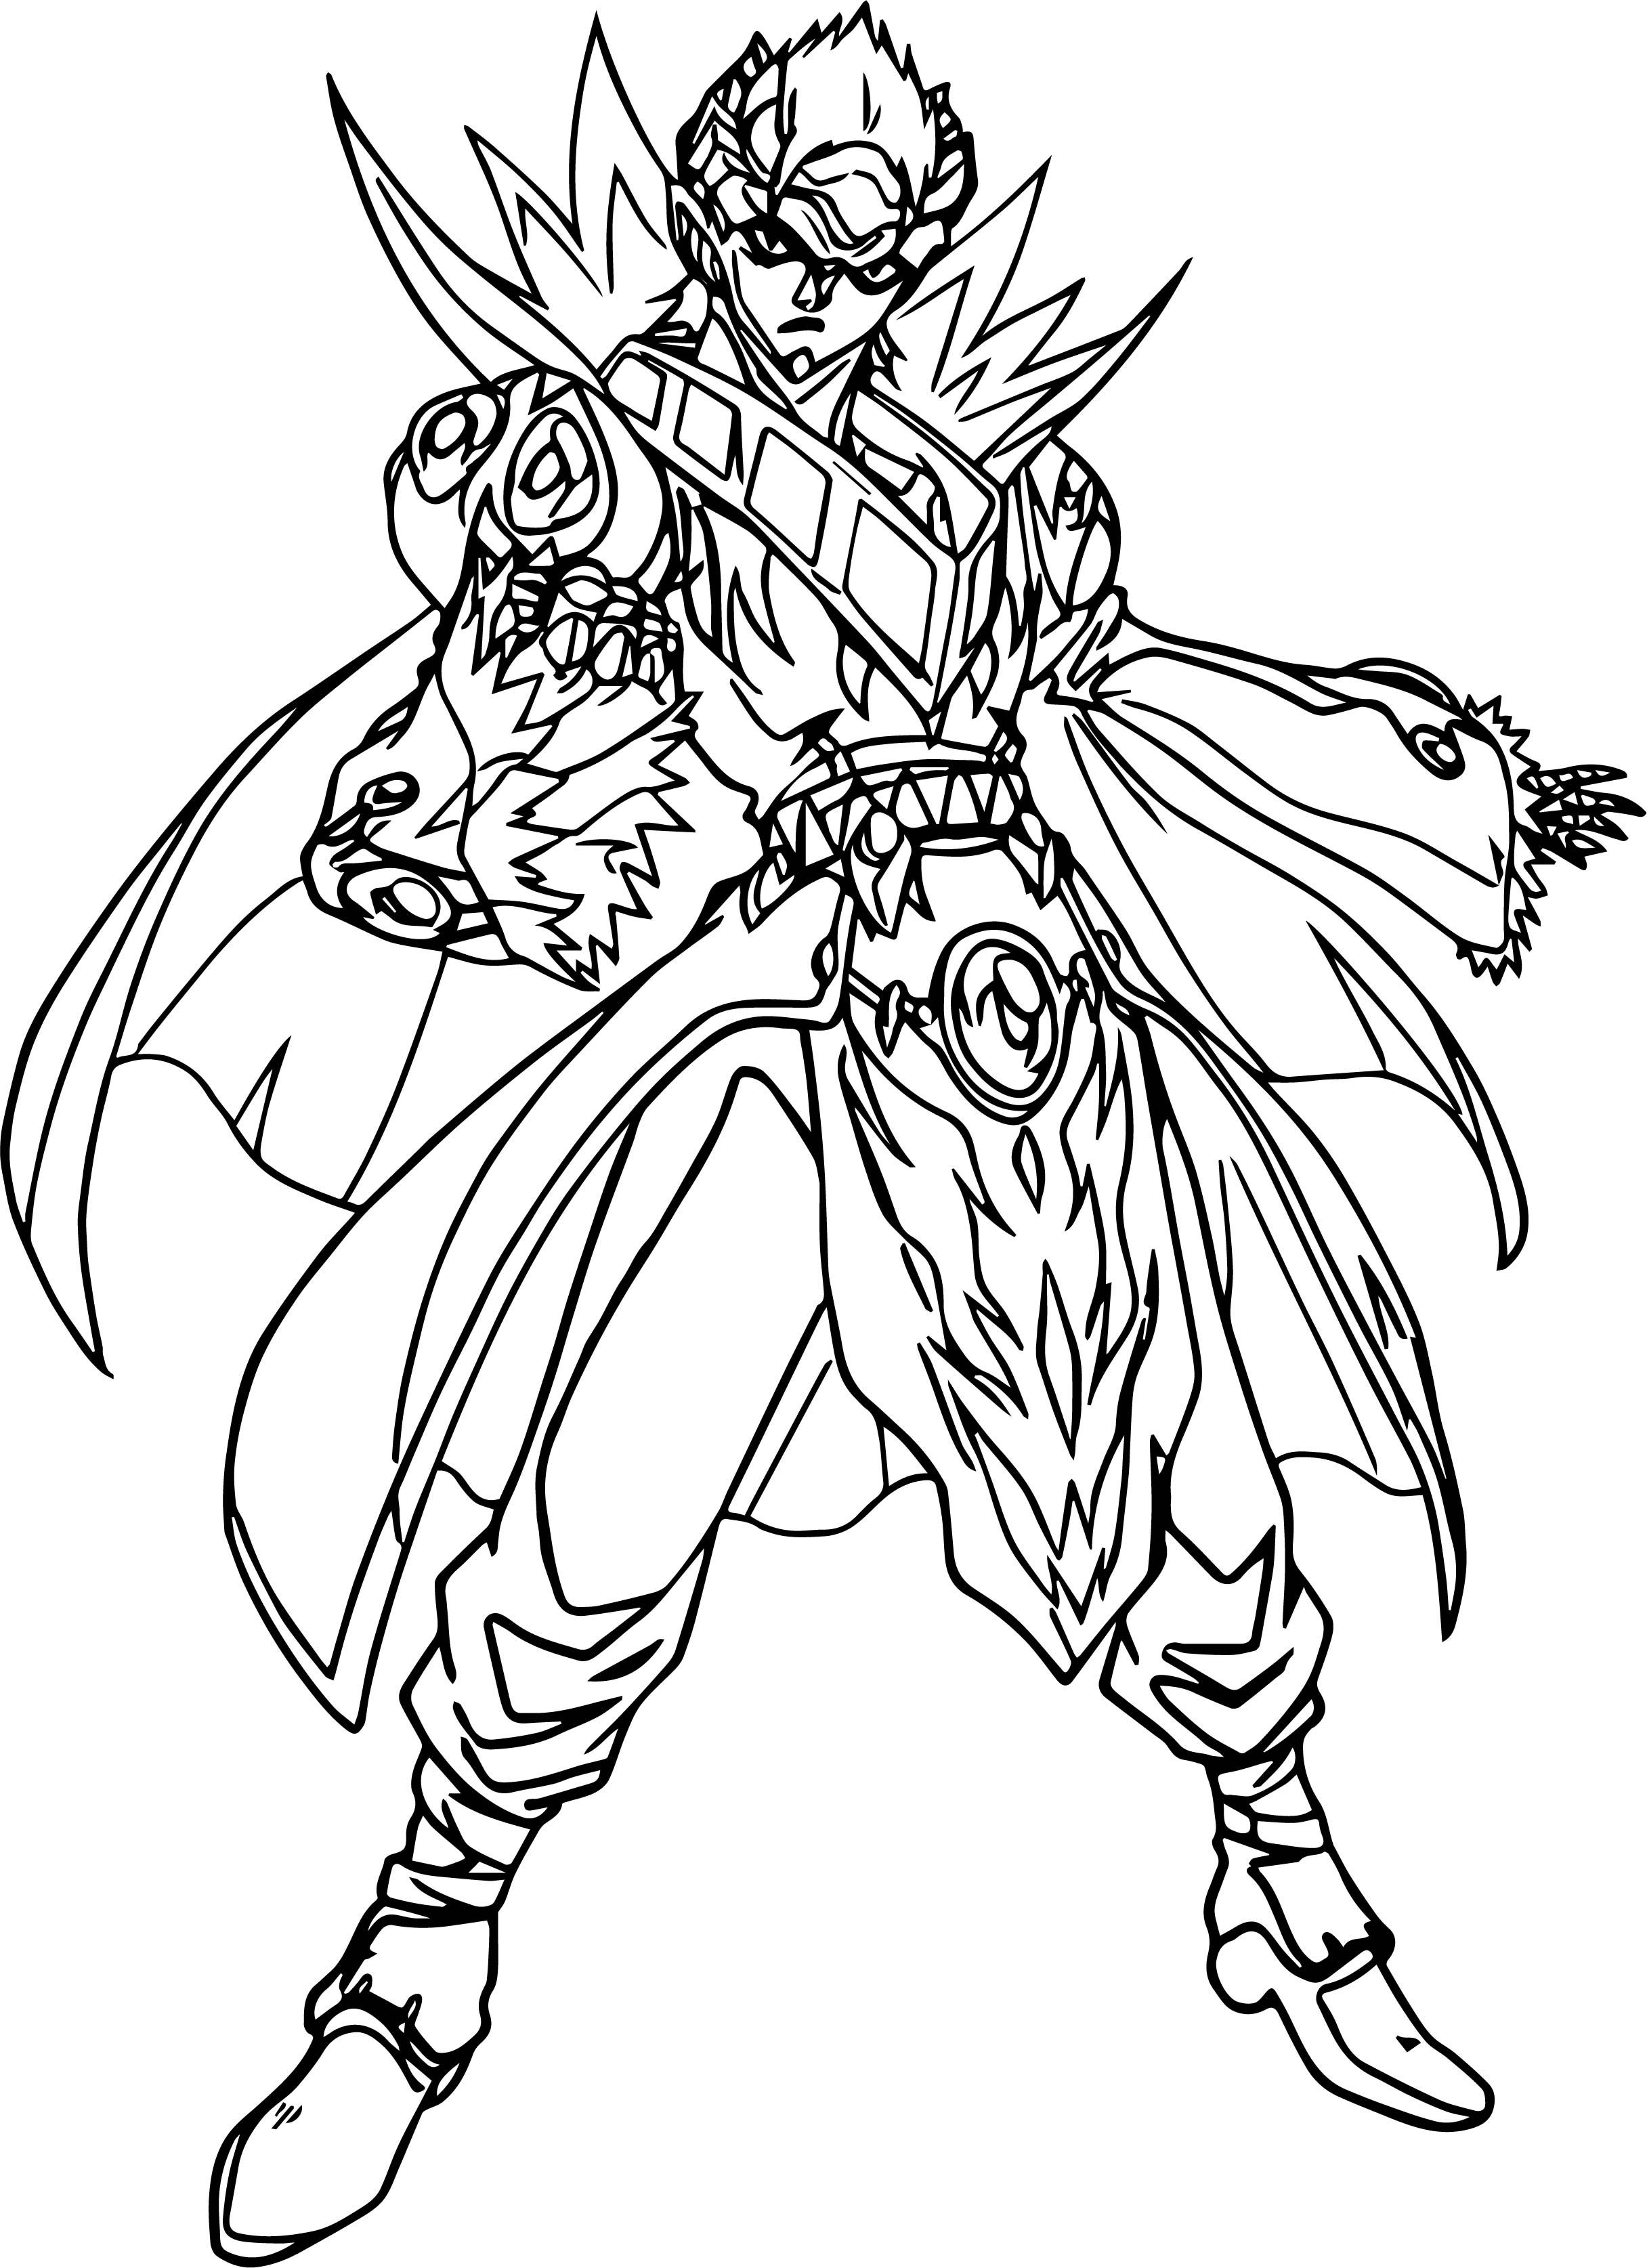 cool Bakugan Gundalian Invaders Coloring Page | Coloring ...